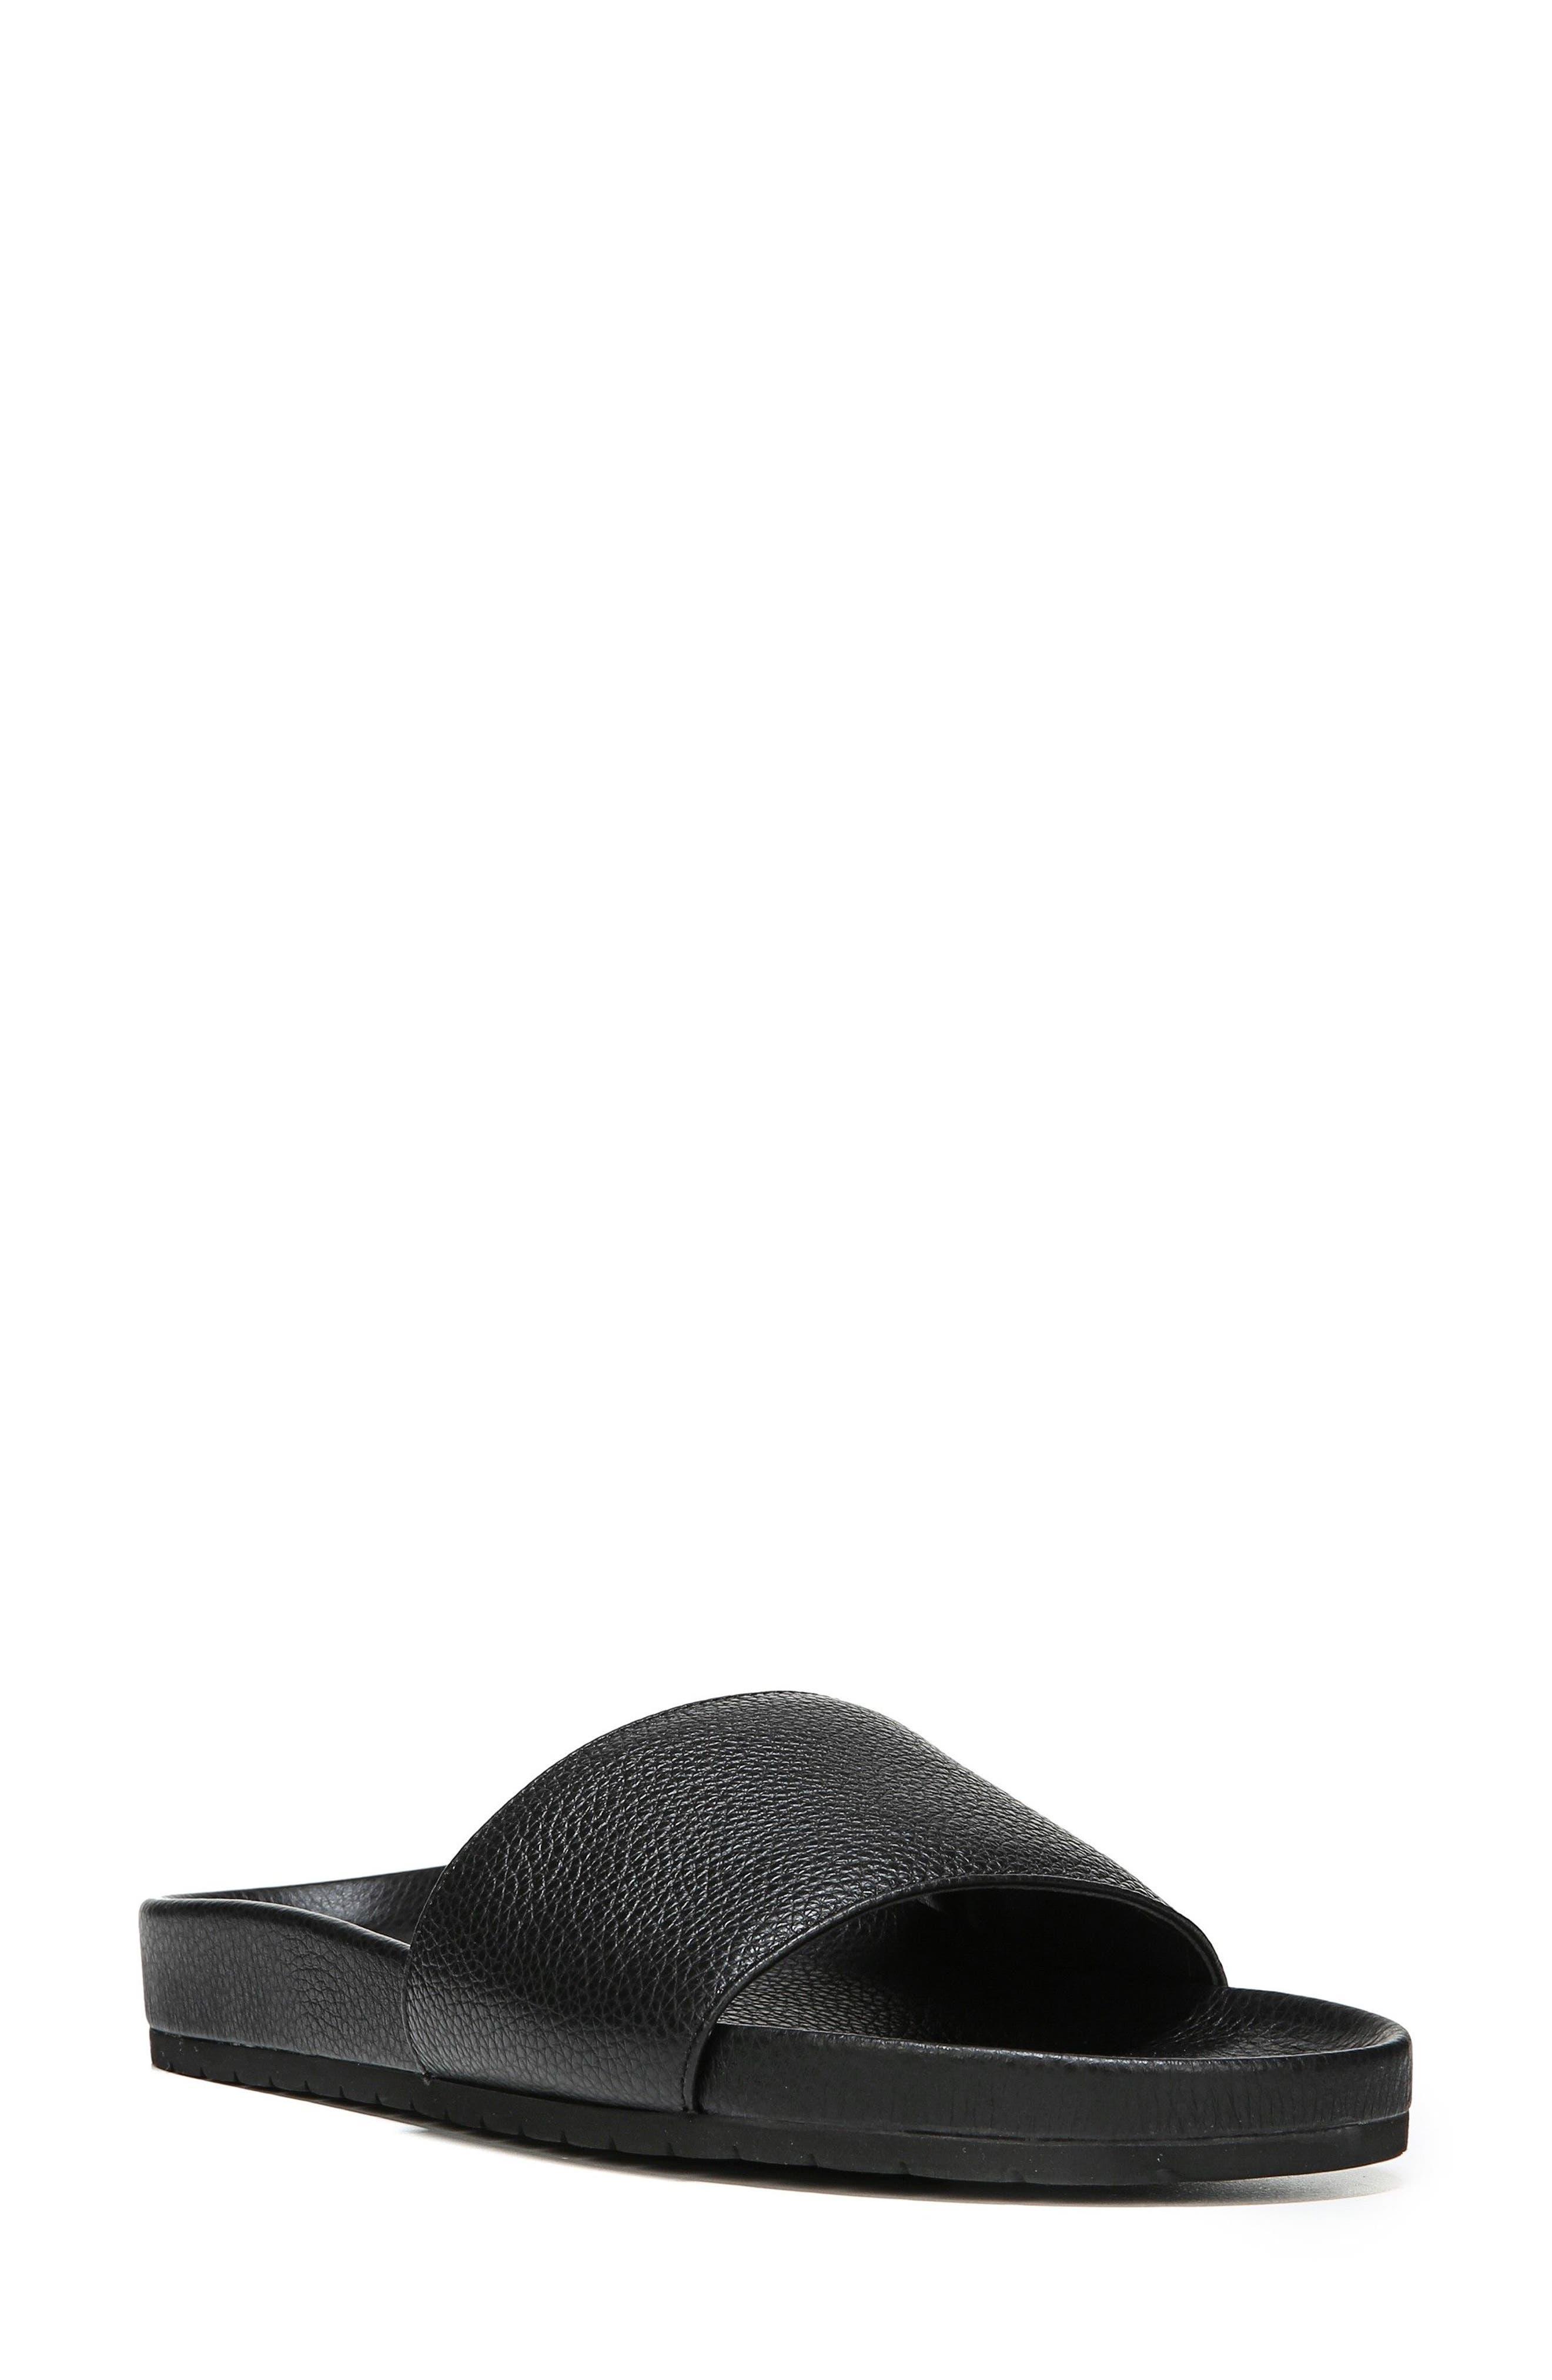 Gavin Slide Sandal,                             Main thumbnail 1, color,                             Black